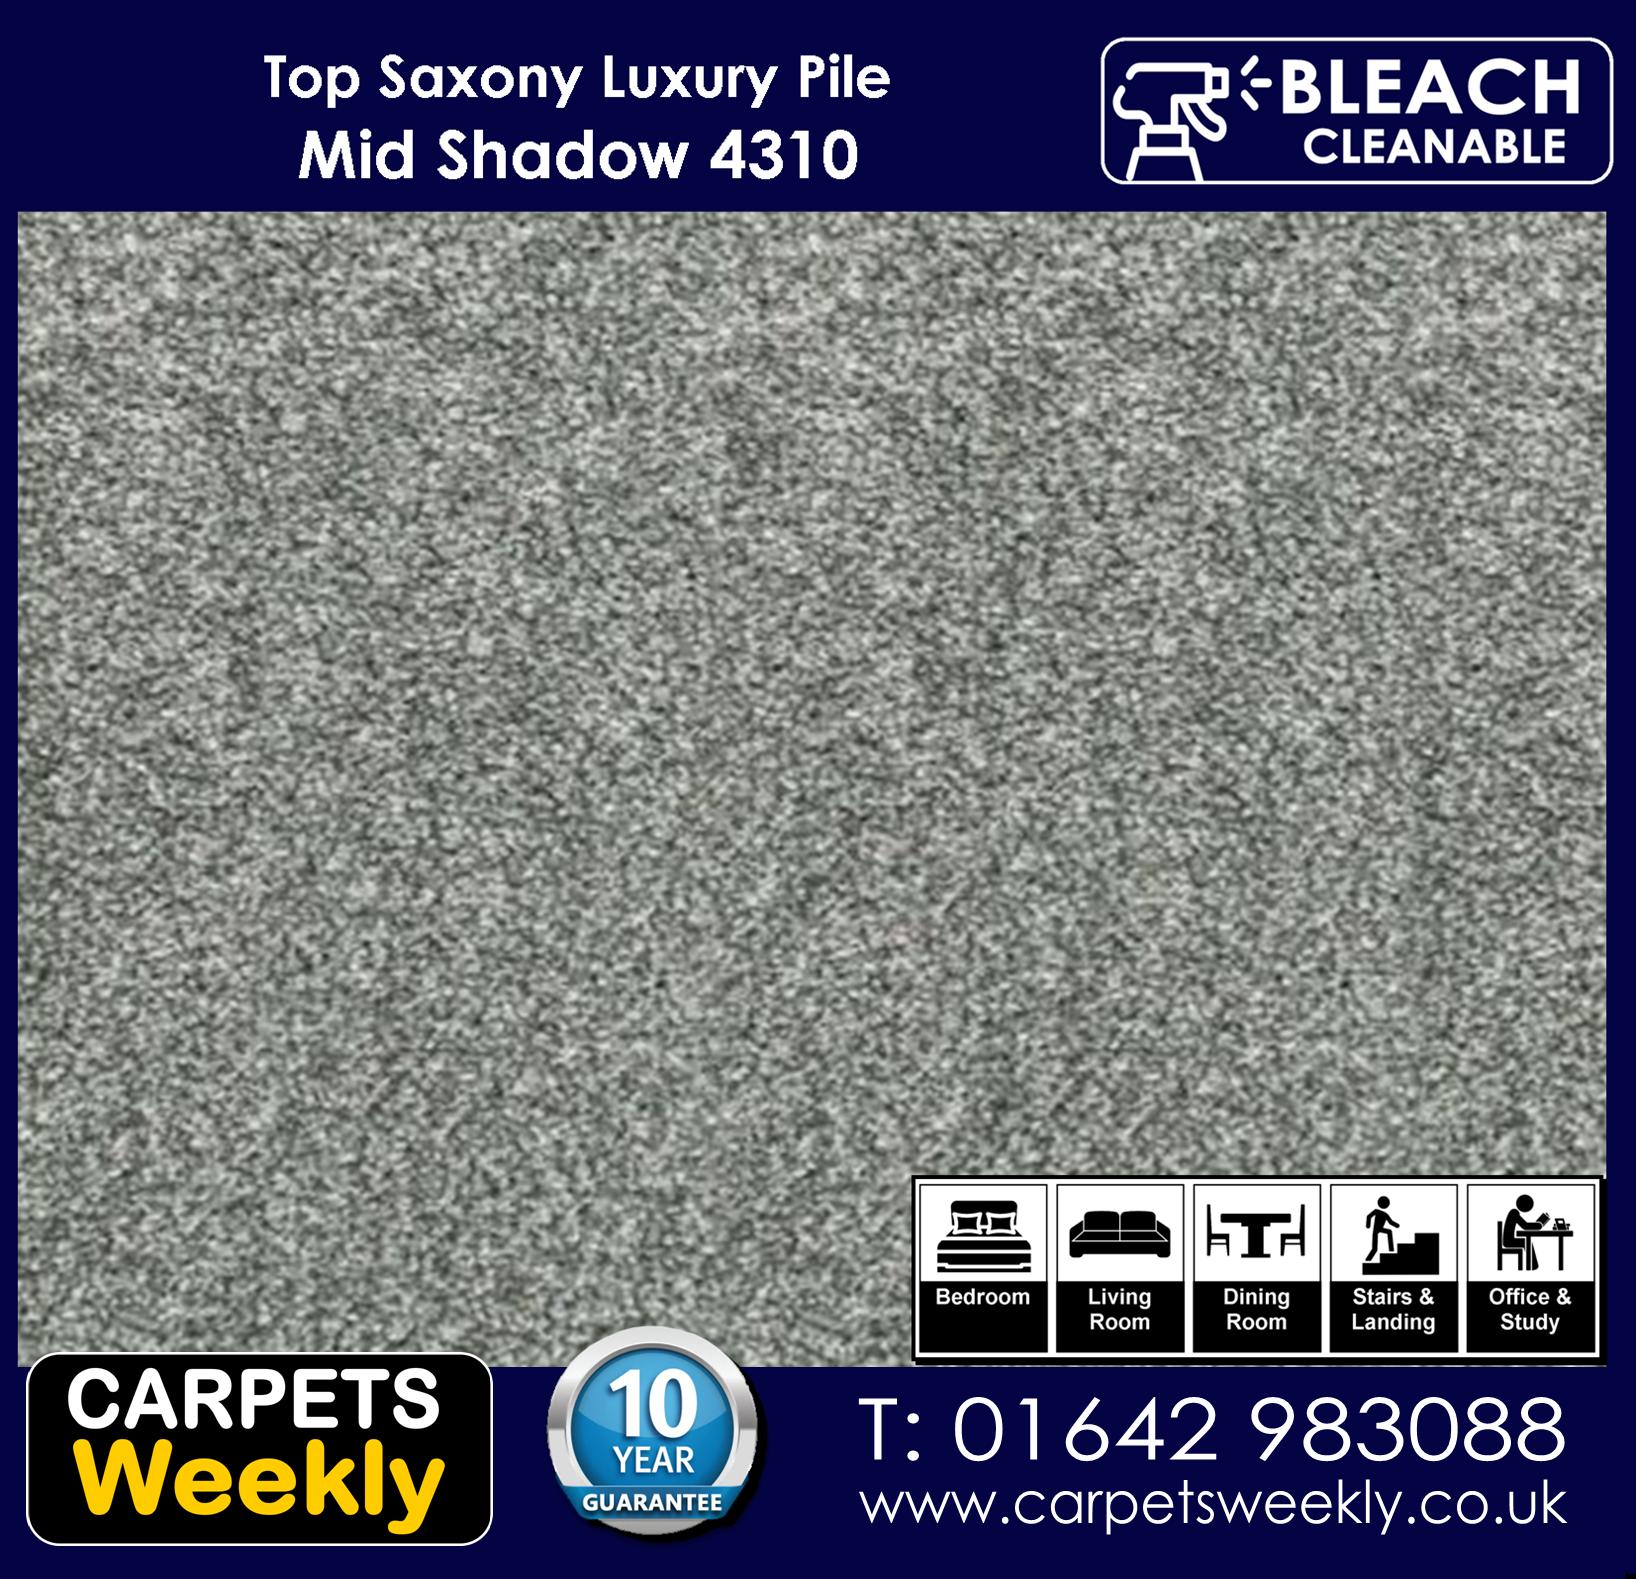 Top Saxony Mid Shadow - 4310 Carpet. Carpets Weekly